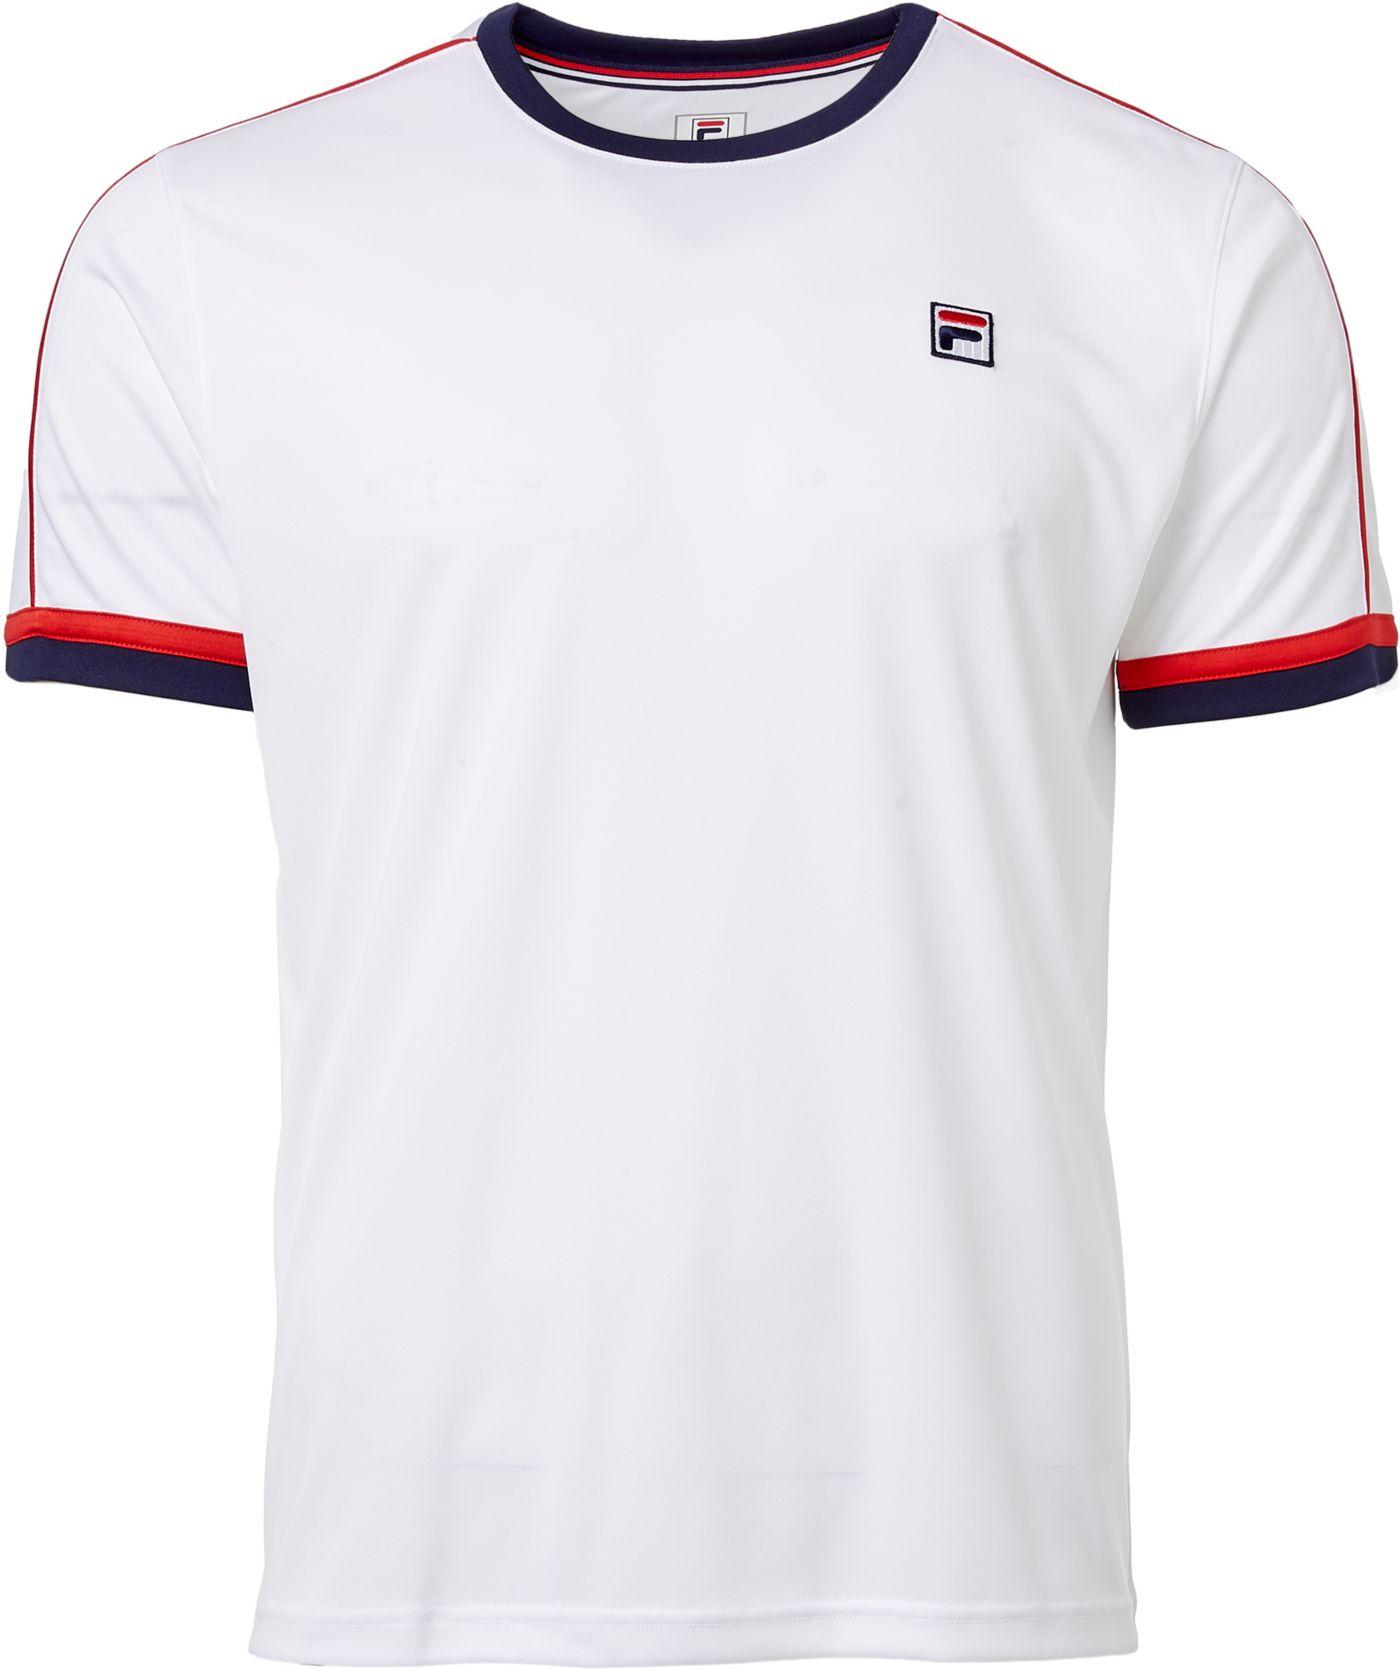 FILA Men's Heritage Piped Crew Tennis T-Shirt